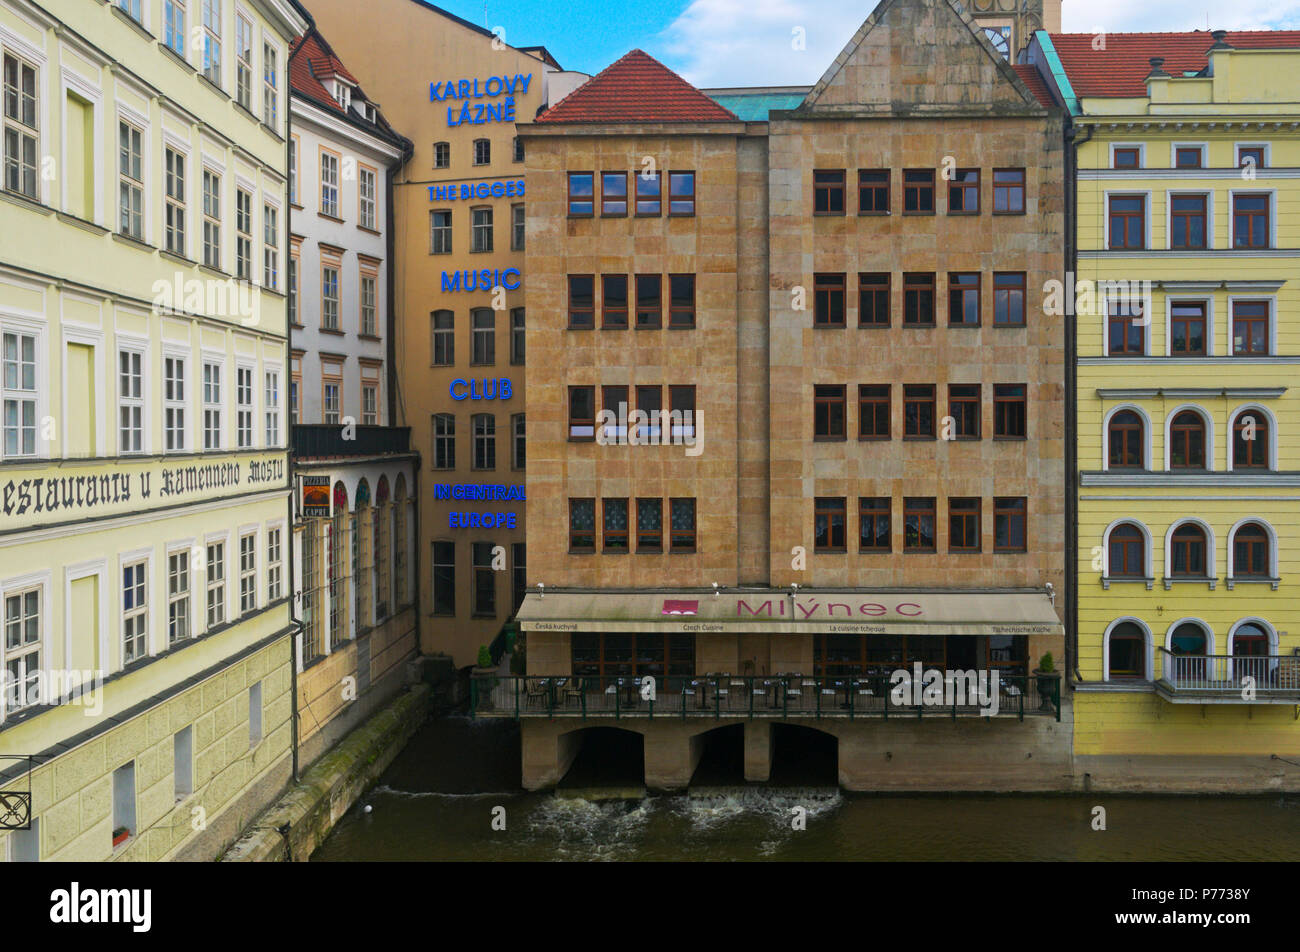 music club Karlovy Lazne and Mlynec restaurant, Vltava riverside, Novotneho Lavka, Old Town Prague, Czech Republic - Stock Image